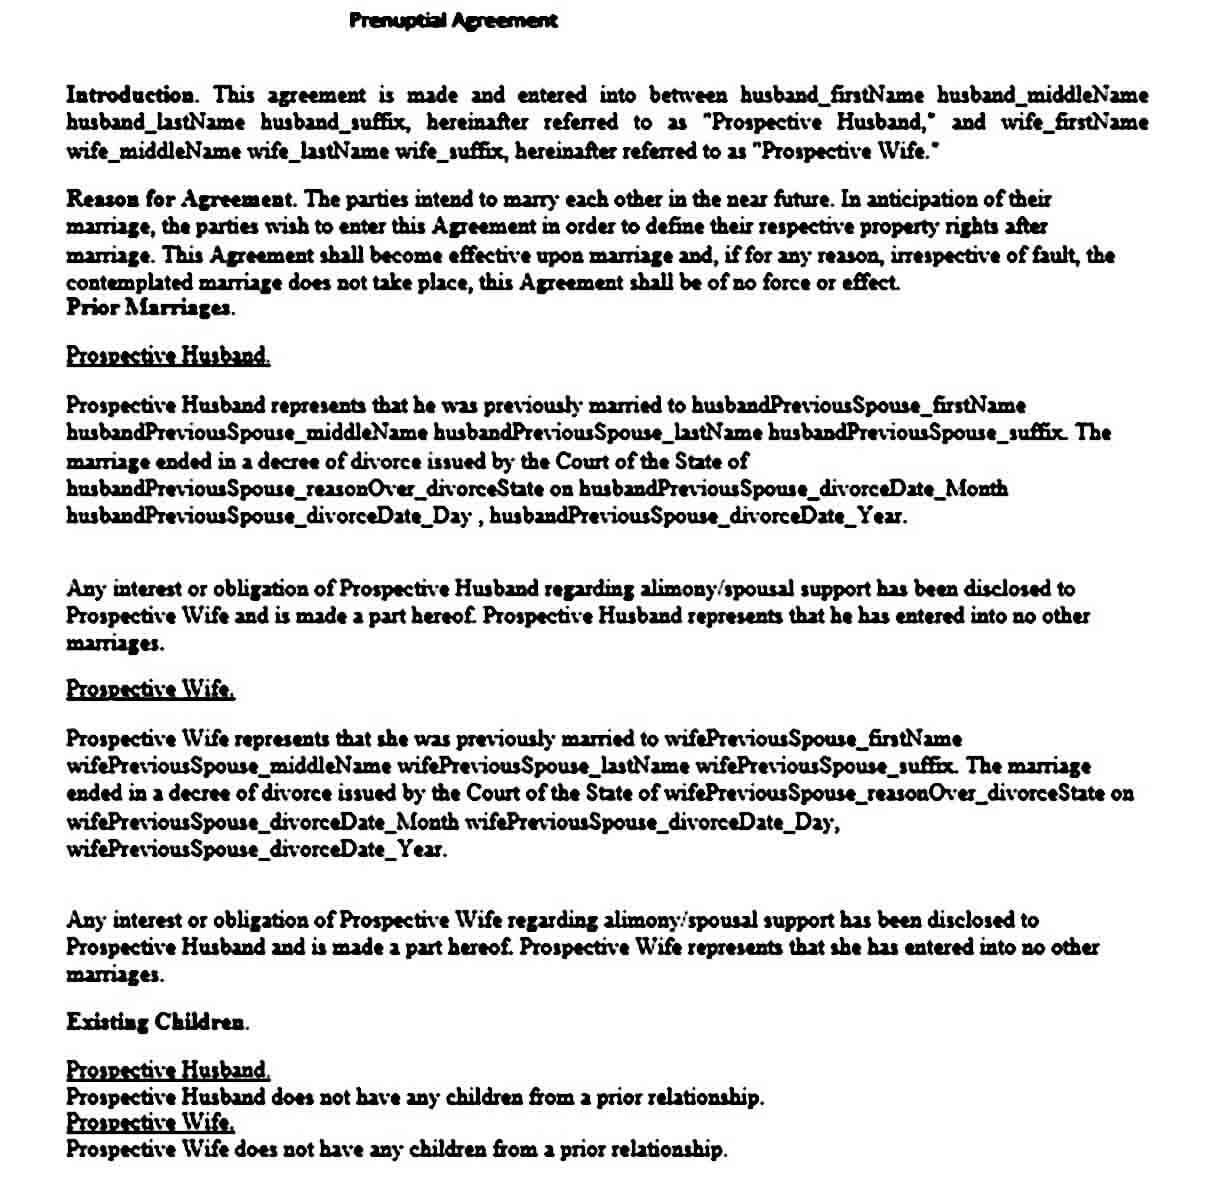 Prenuptial Agreement templates